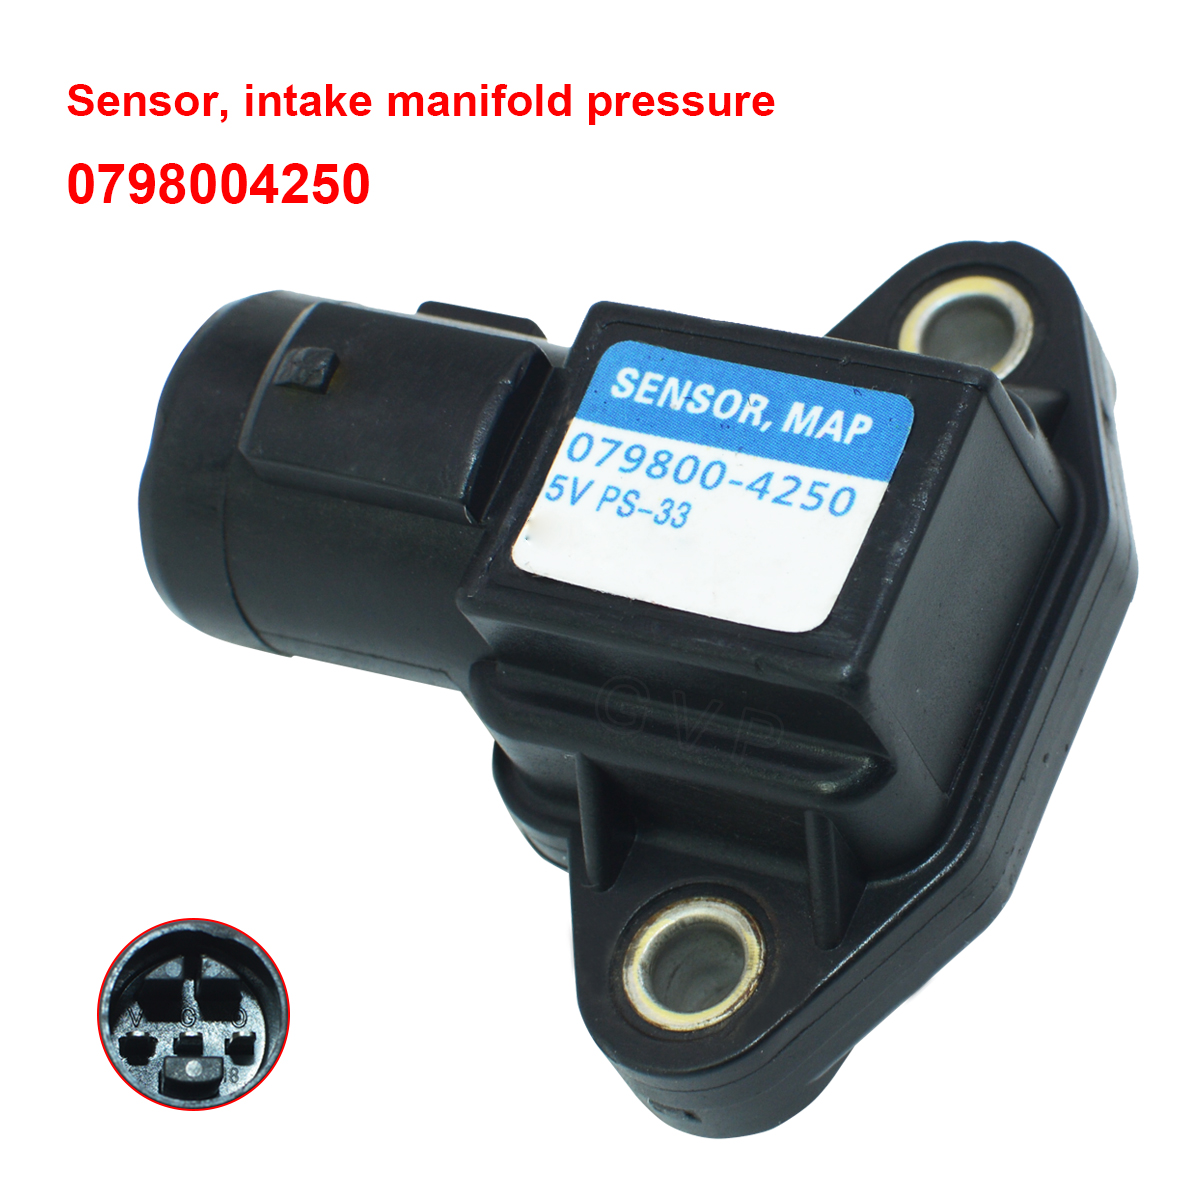 OEM Manifold Air Pressure MAP Sensor for Honda Acura Isuzu Accord 0798004250